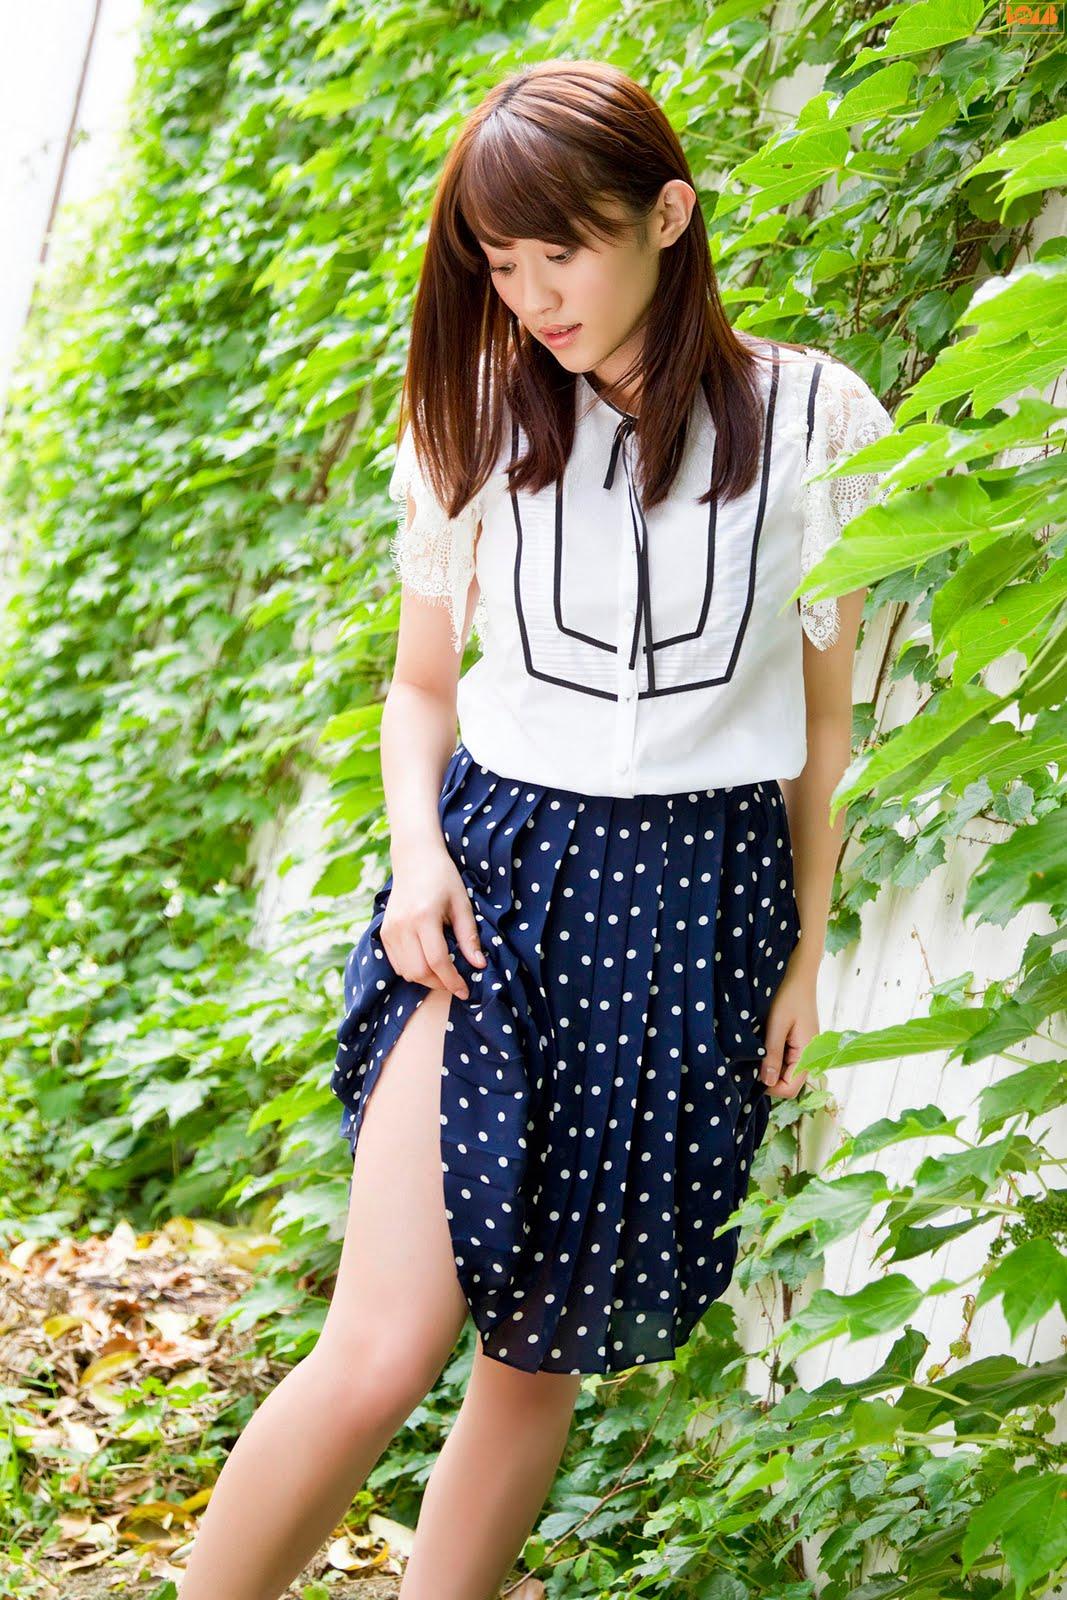 Mikie Hara In Nature  Japanese Girls 2011-3554